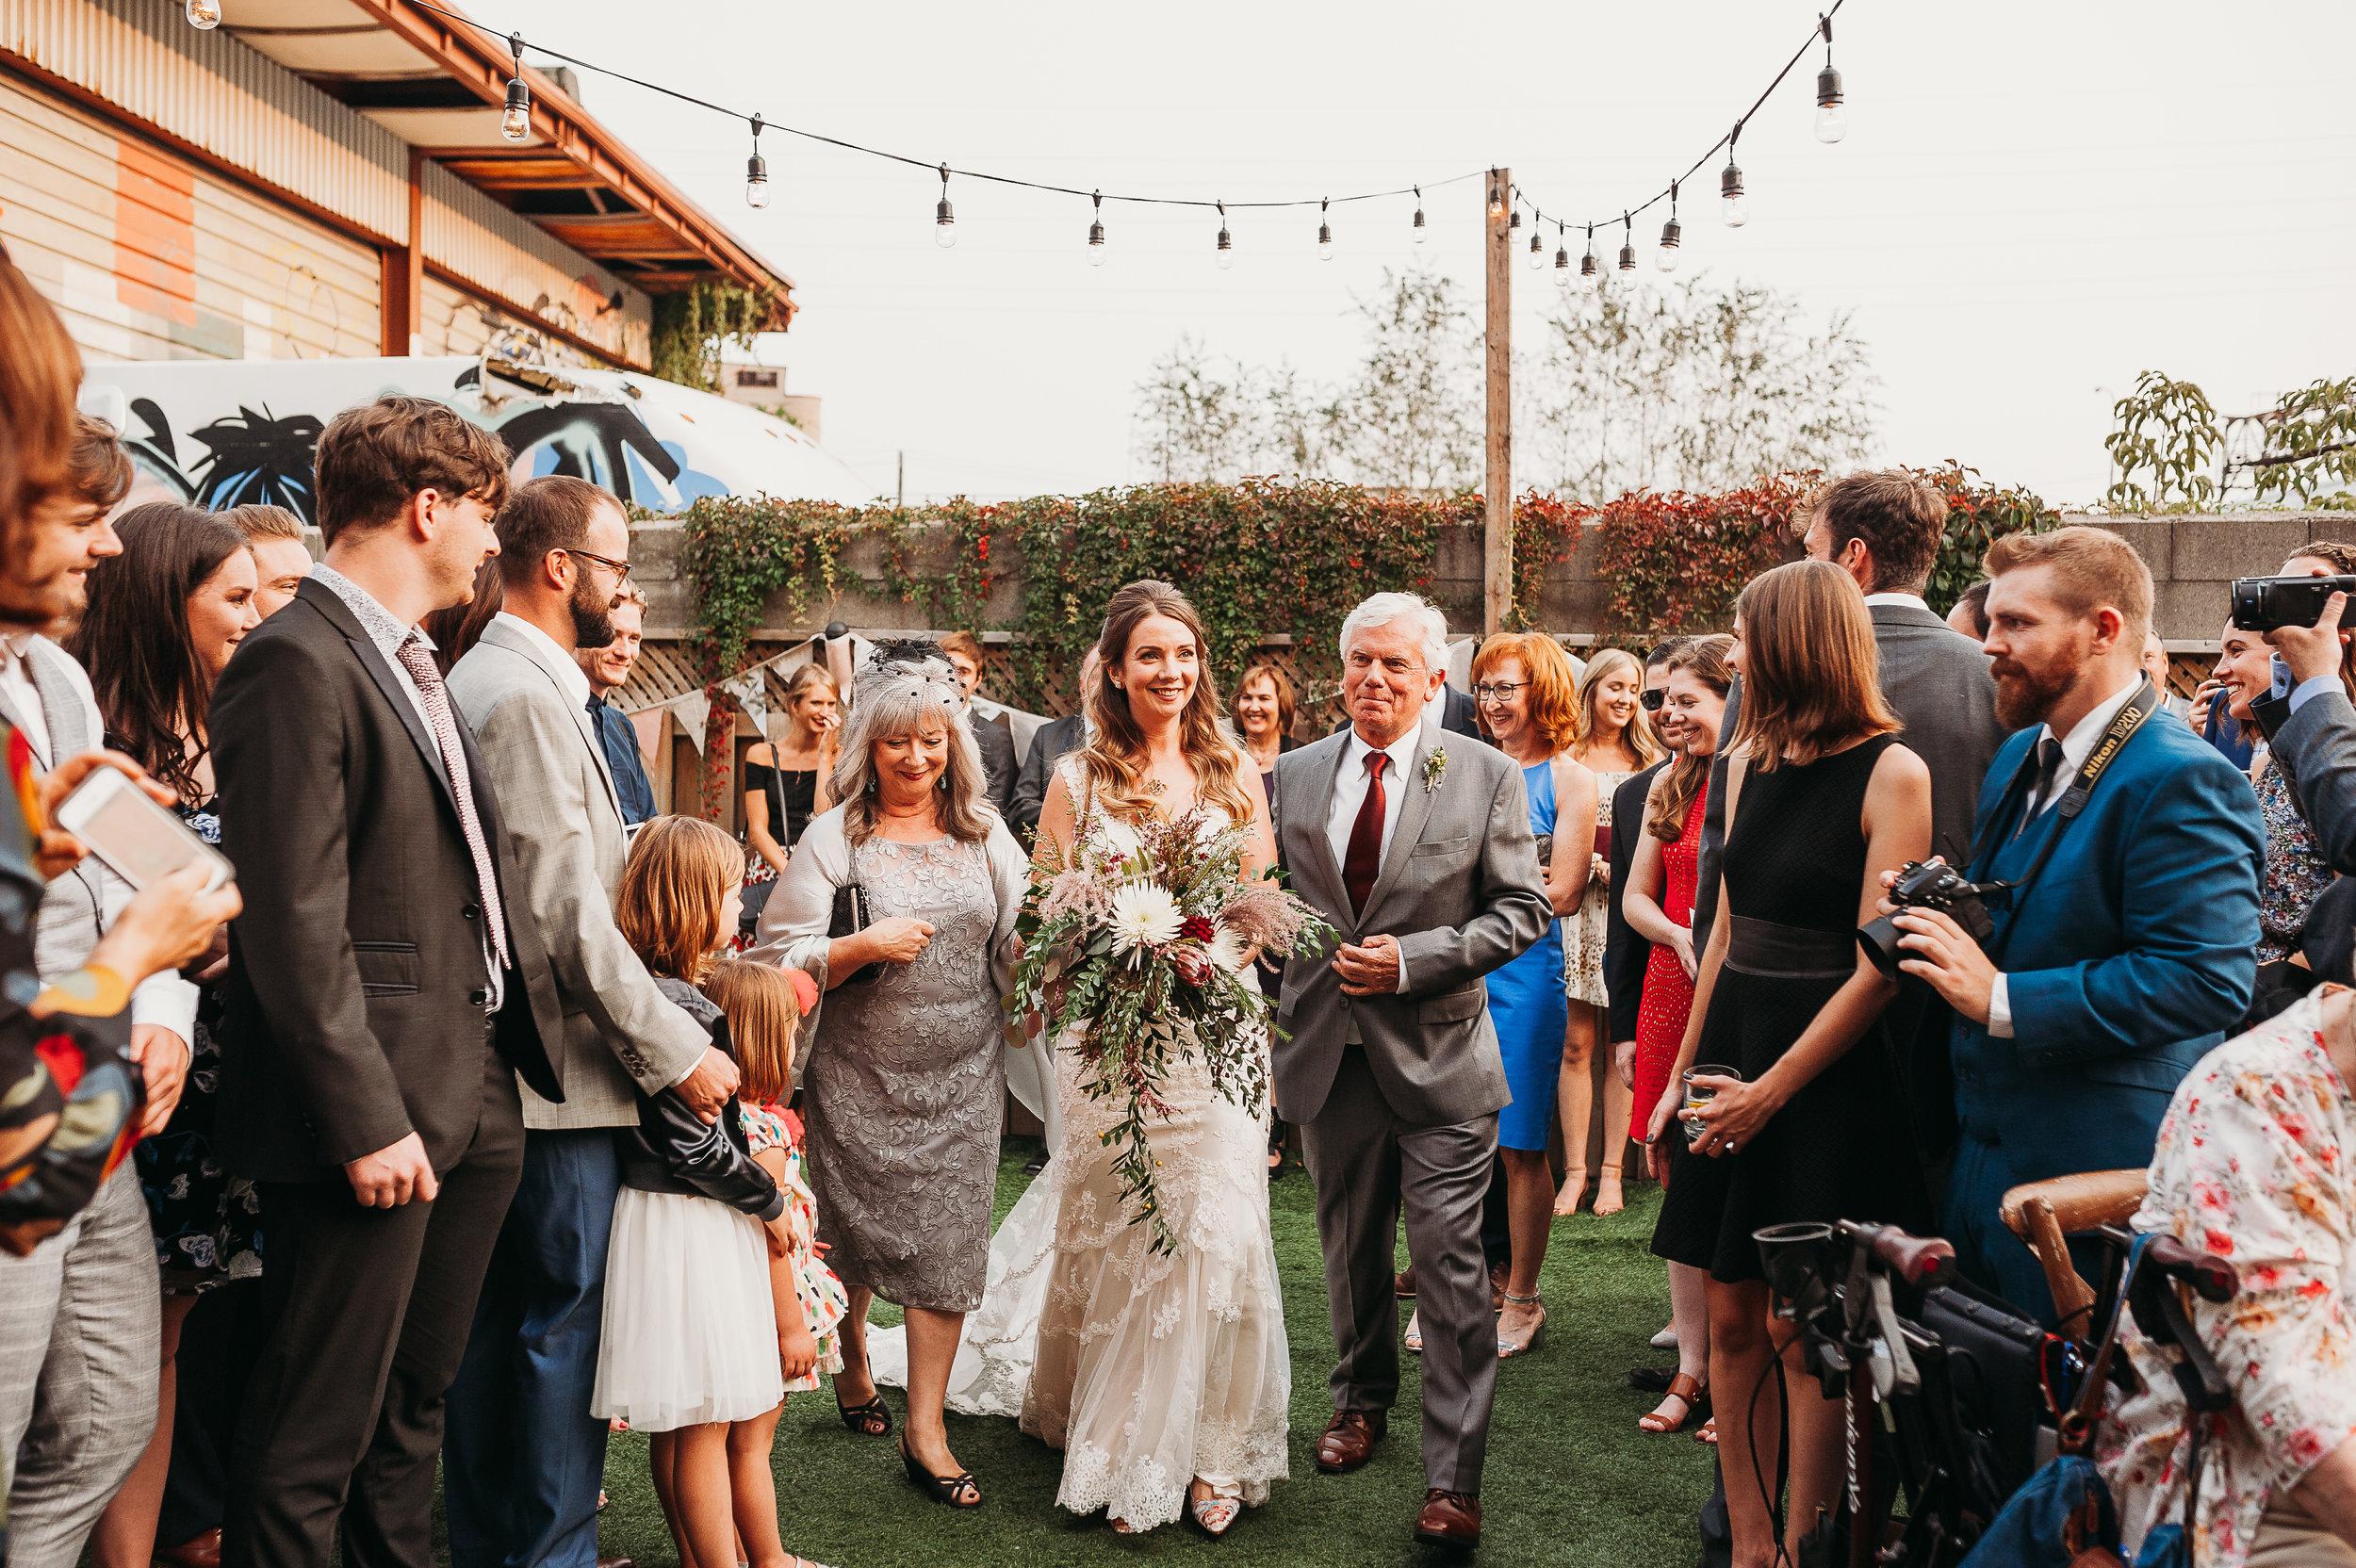 wedding-ceremony-toronto-rustic-boho-airship37-wedding-by-willow-birch-photo-toronto-documentary-wedding-photographers.jpg